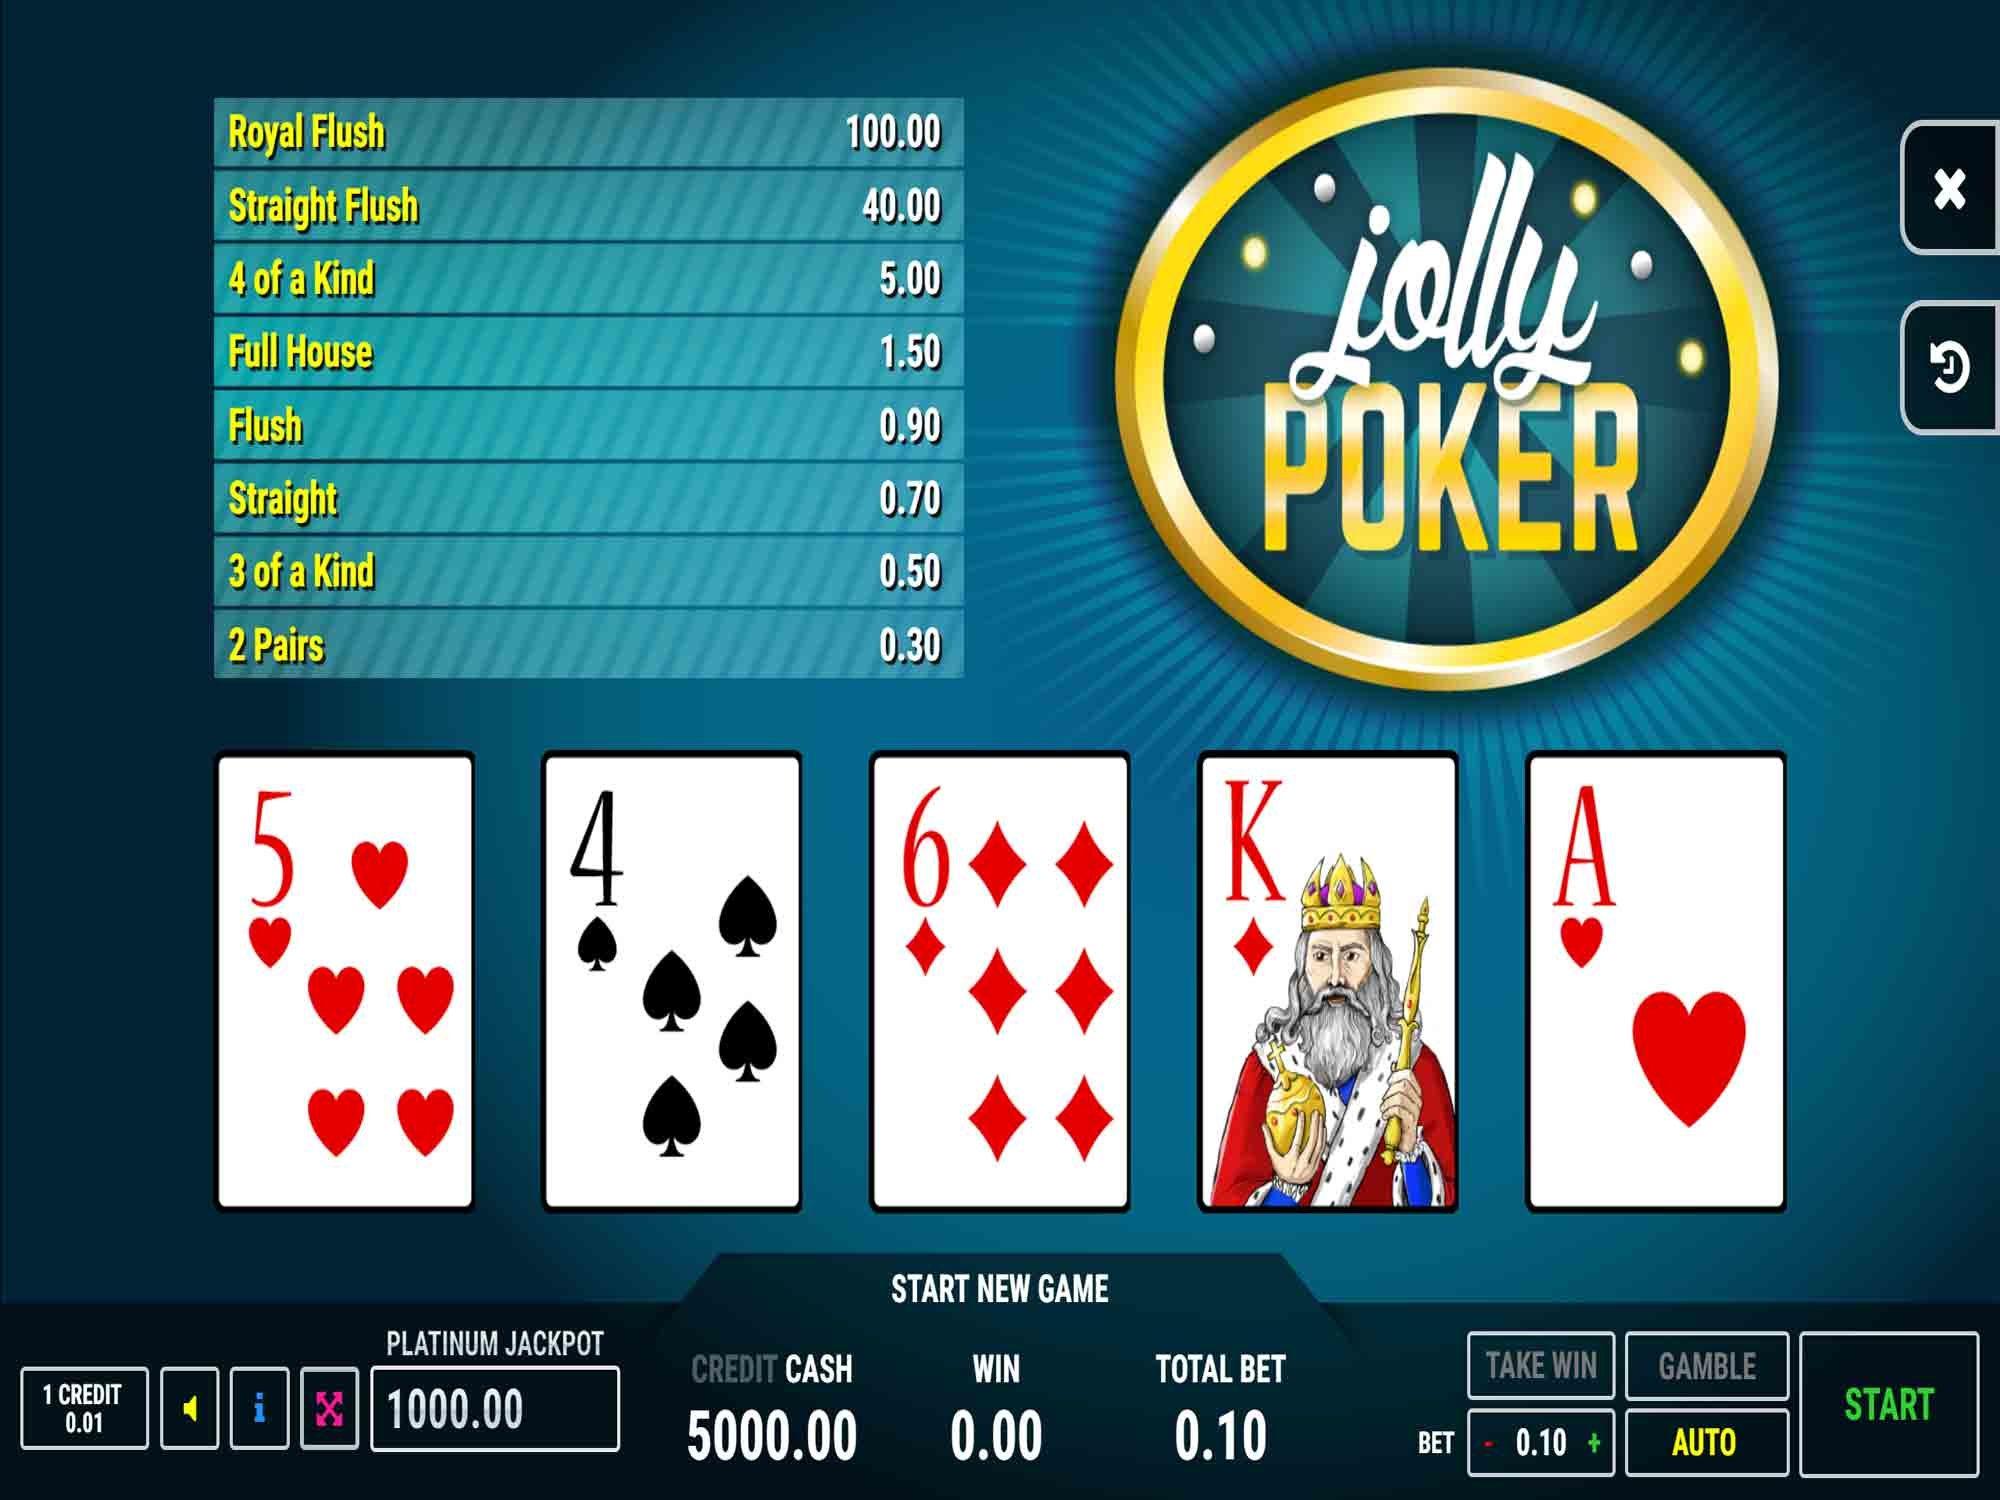 Jolly Poker Video Poker screenshot